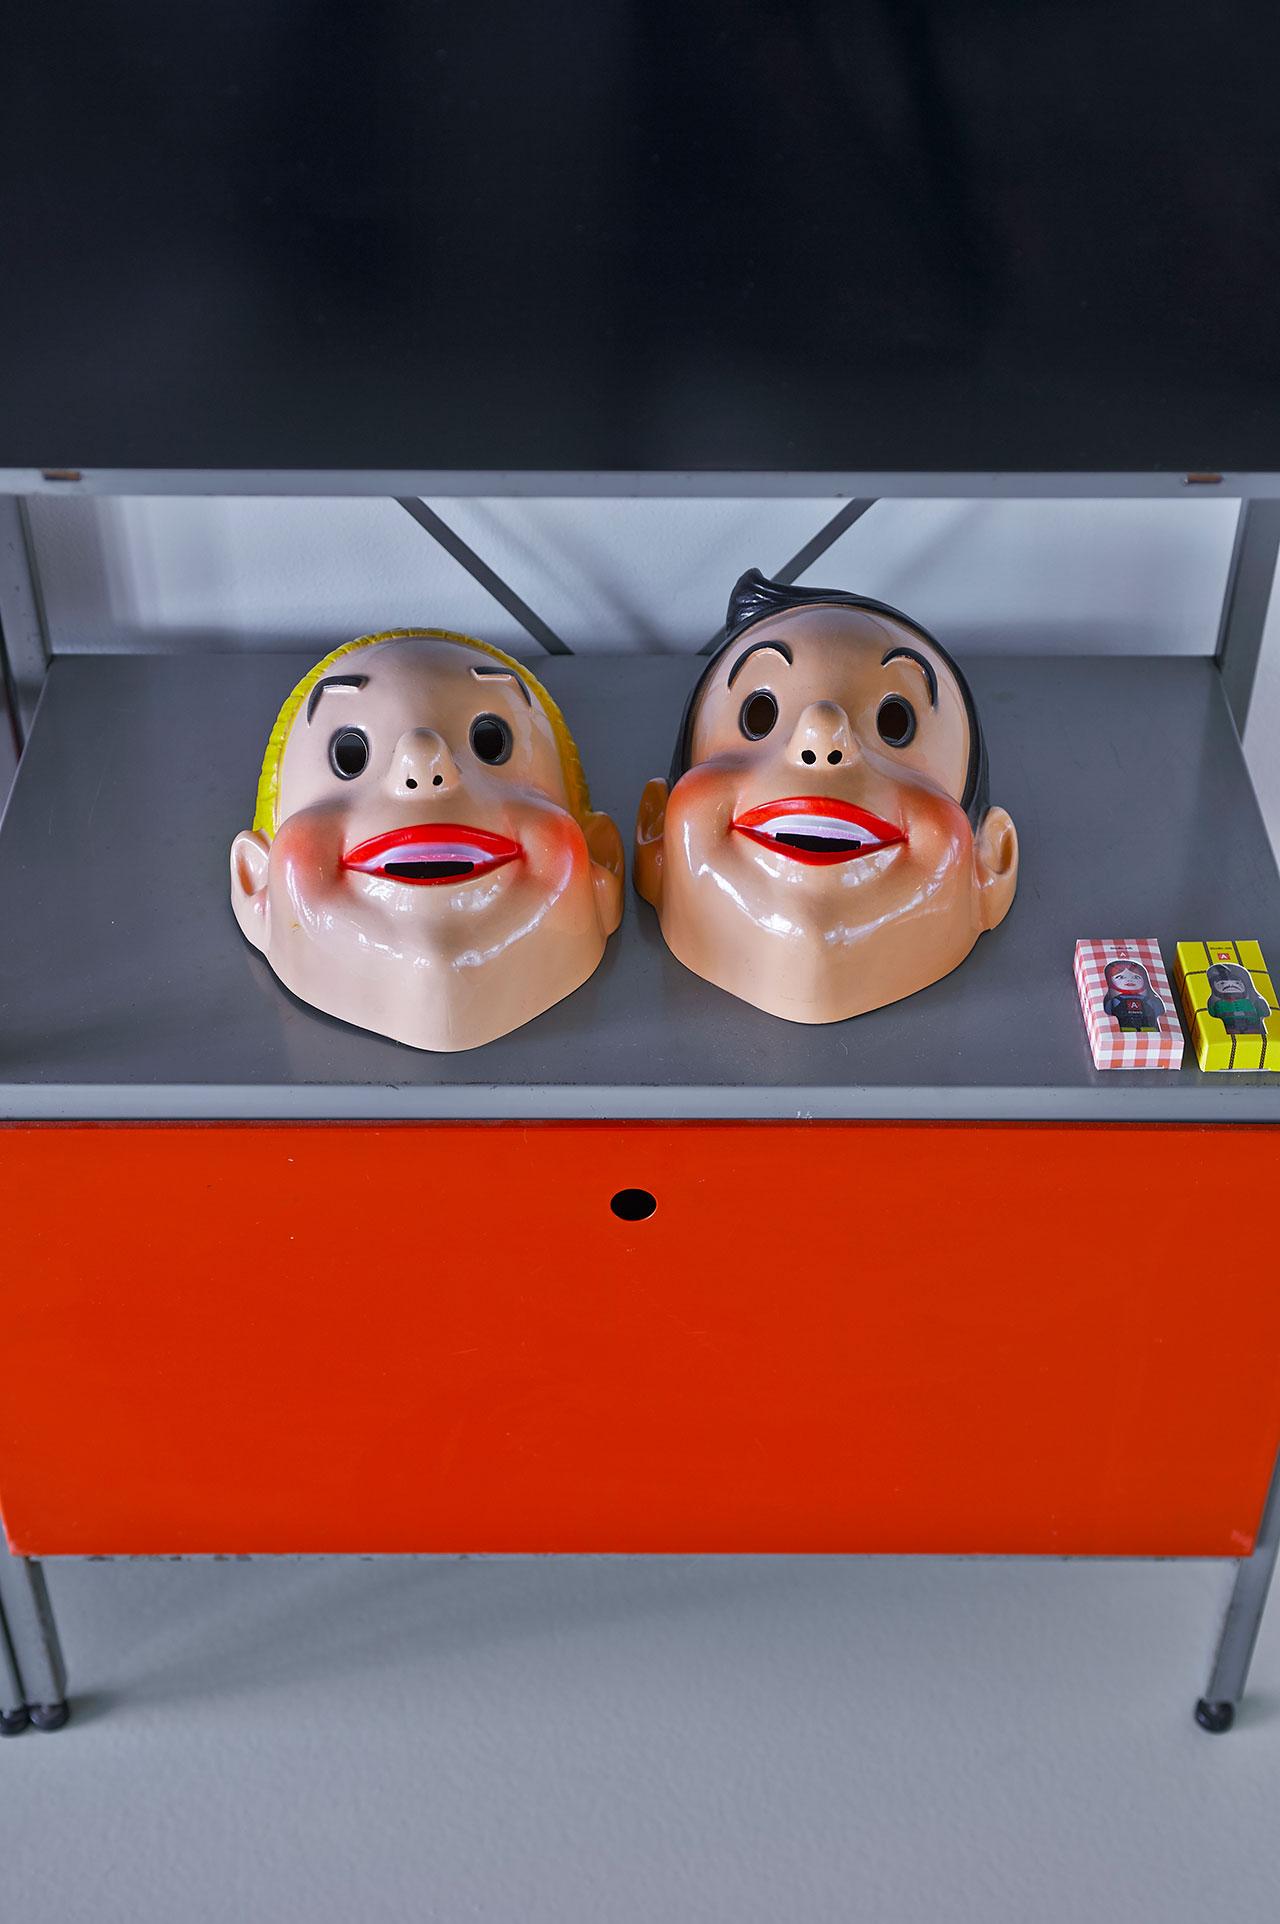 Studio. Cabinet: 663 Gispen, Wim Rietveld, 1954. Masks, Suske & Wiske, 60 years.USB Sticks: Farm, Nynke & Job, 2010.